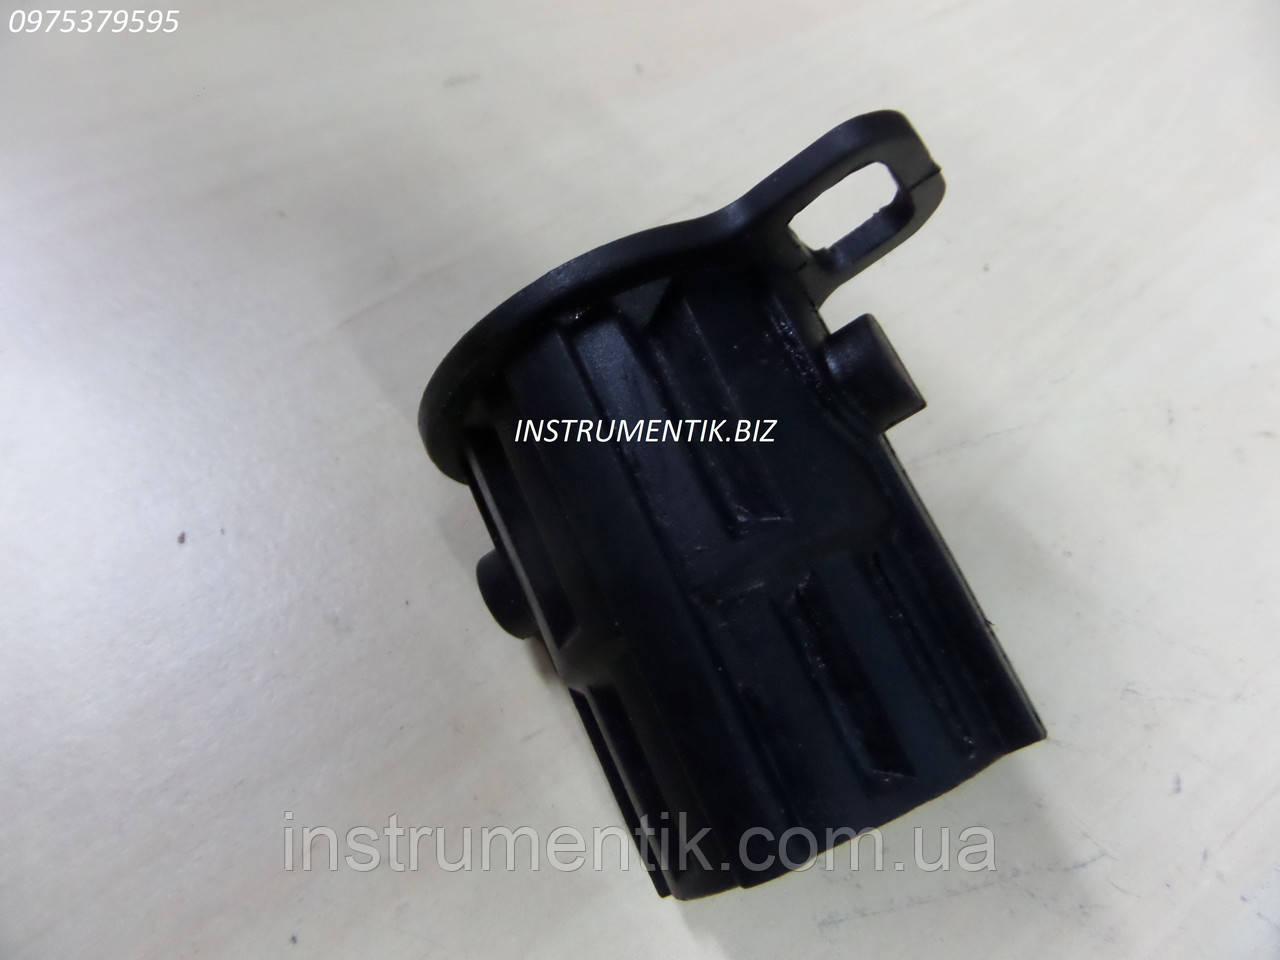 Рукав адаптера для Oleo-Mac Sparta 25/250Т